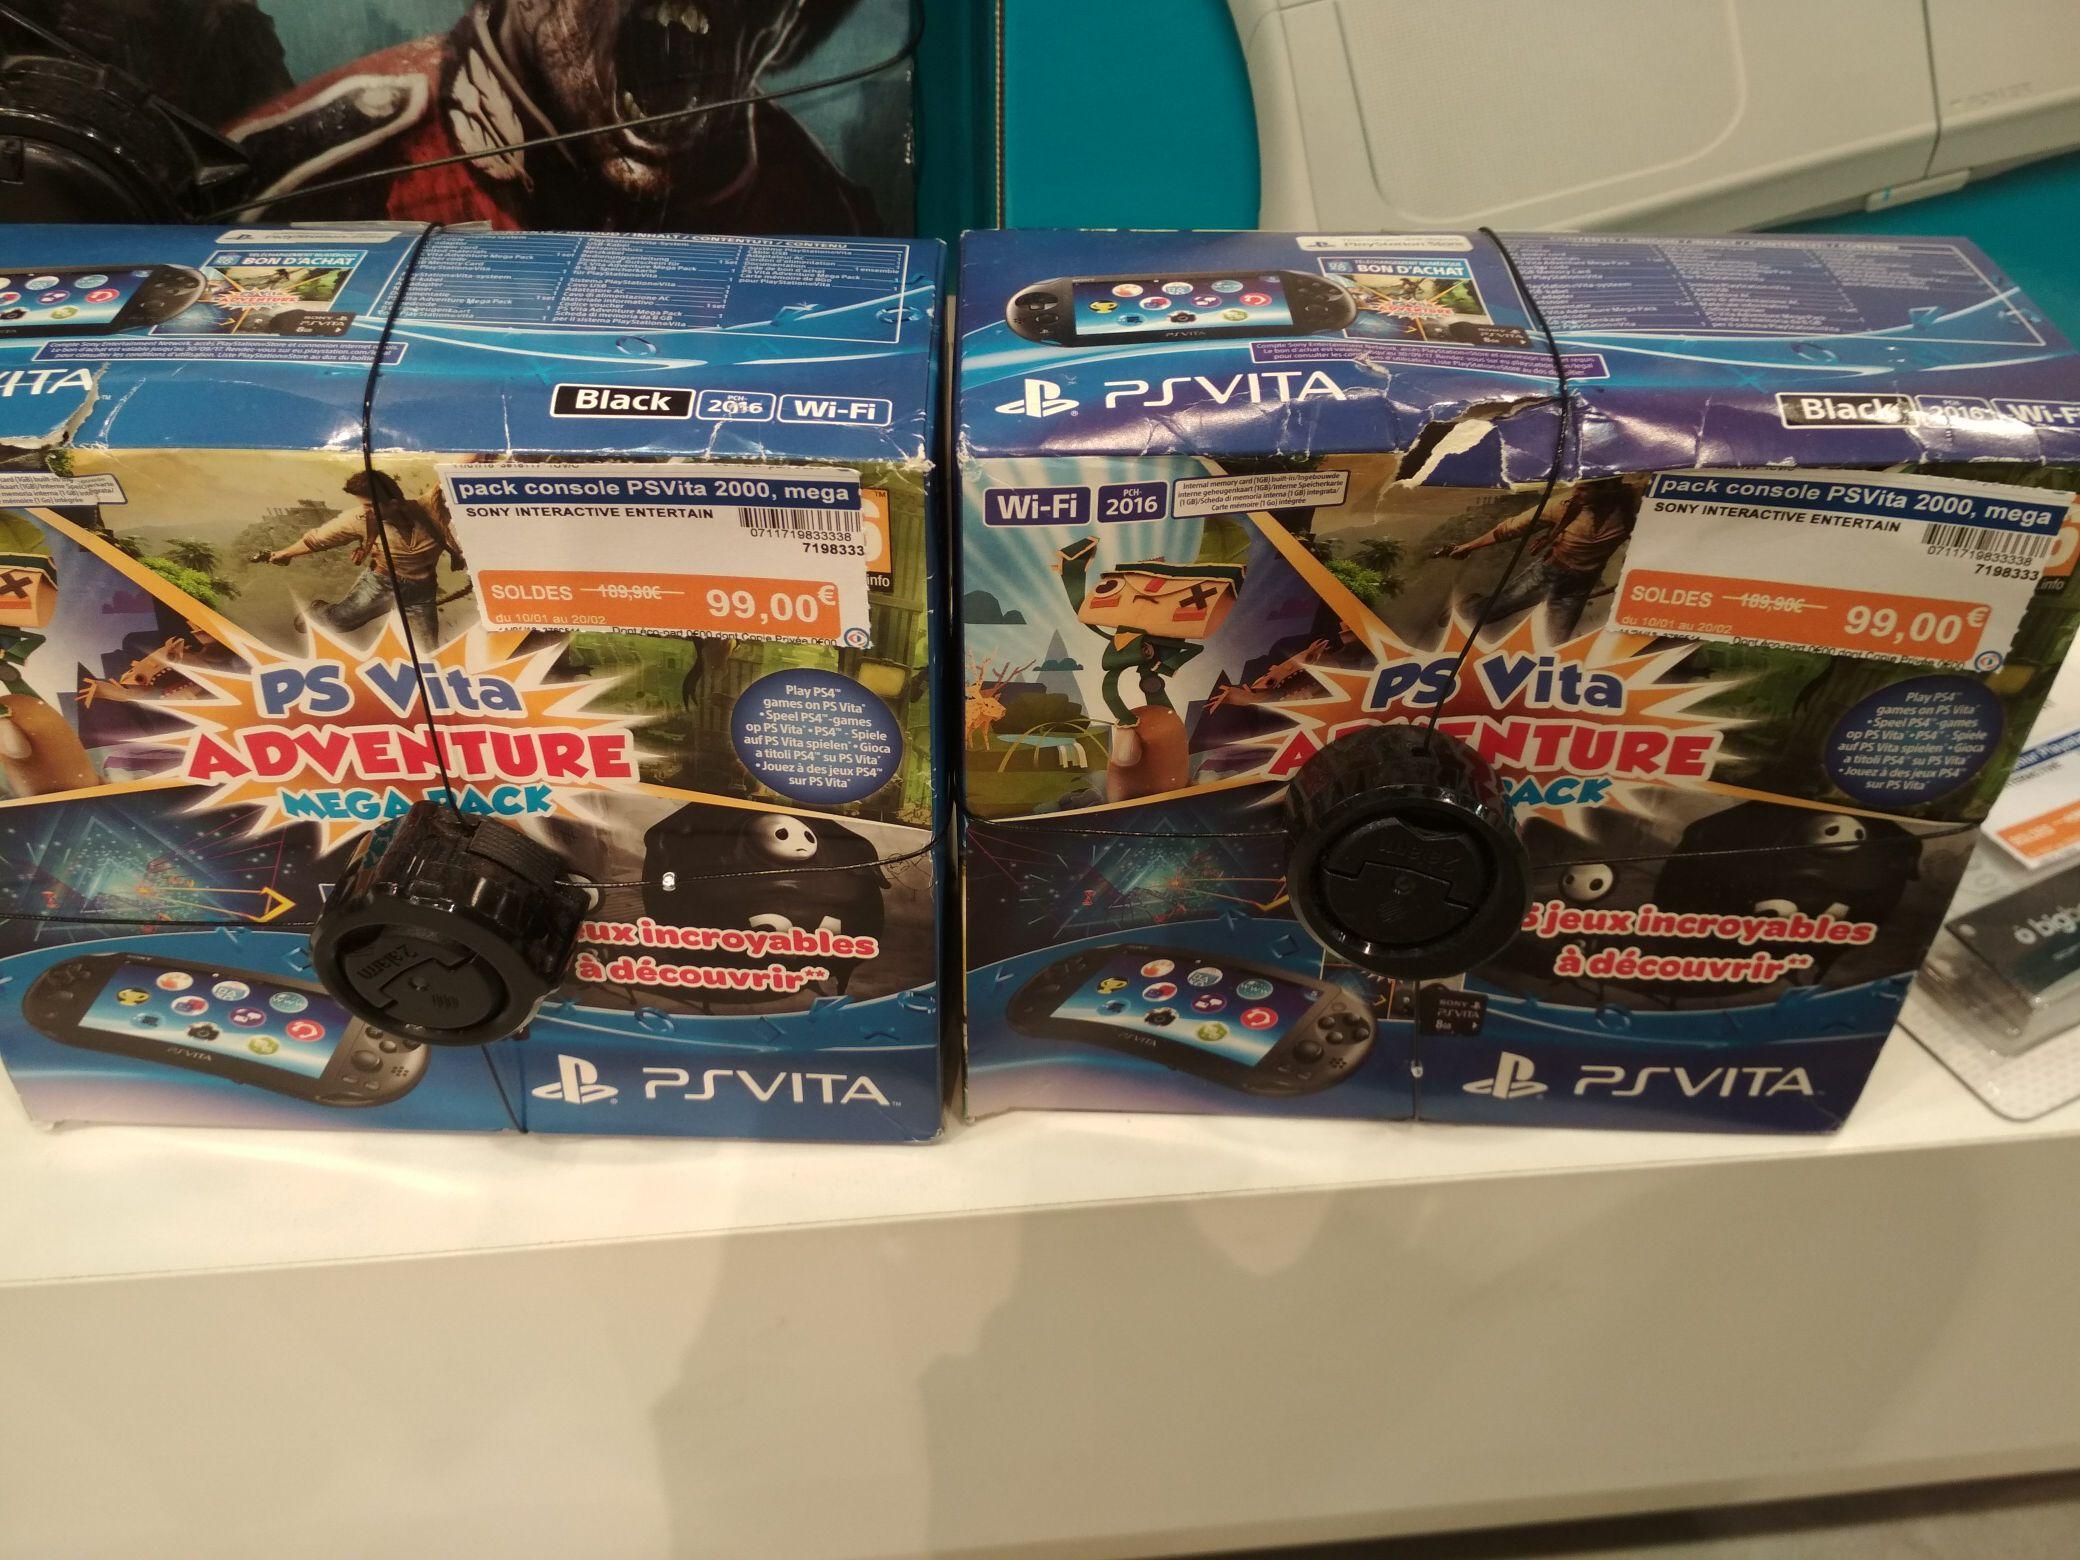 Console Sony PS Vita Adventure Mega Pack - Espace Culturel E.Leclerc Ancenis (44)